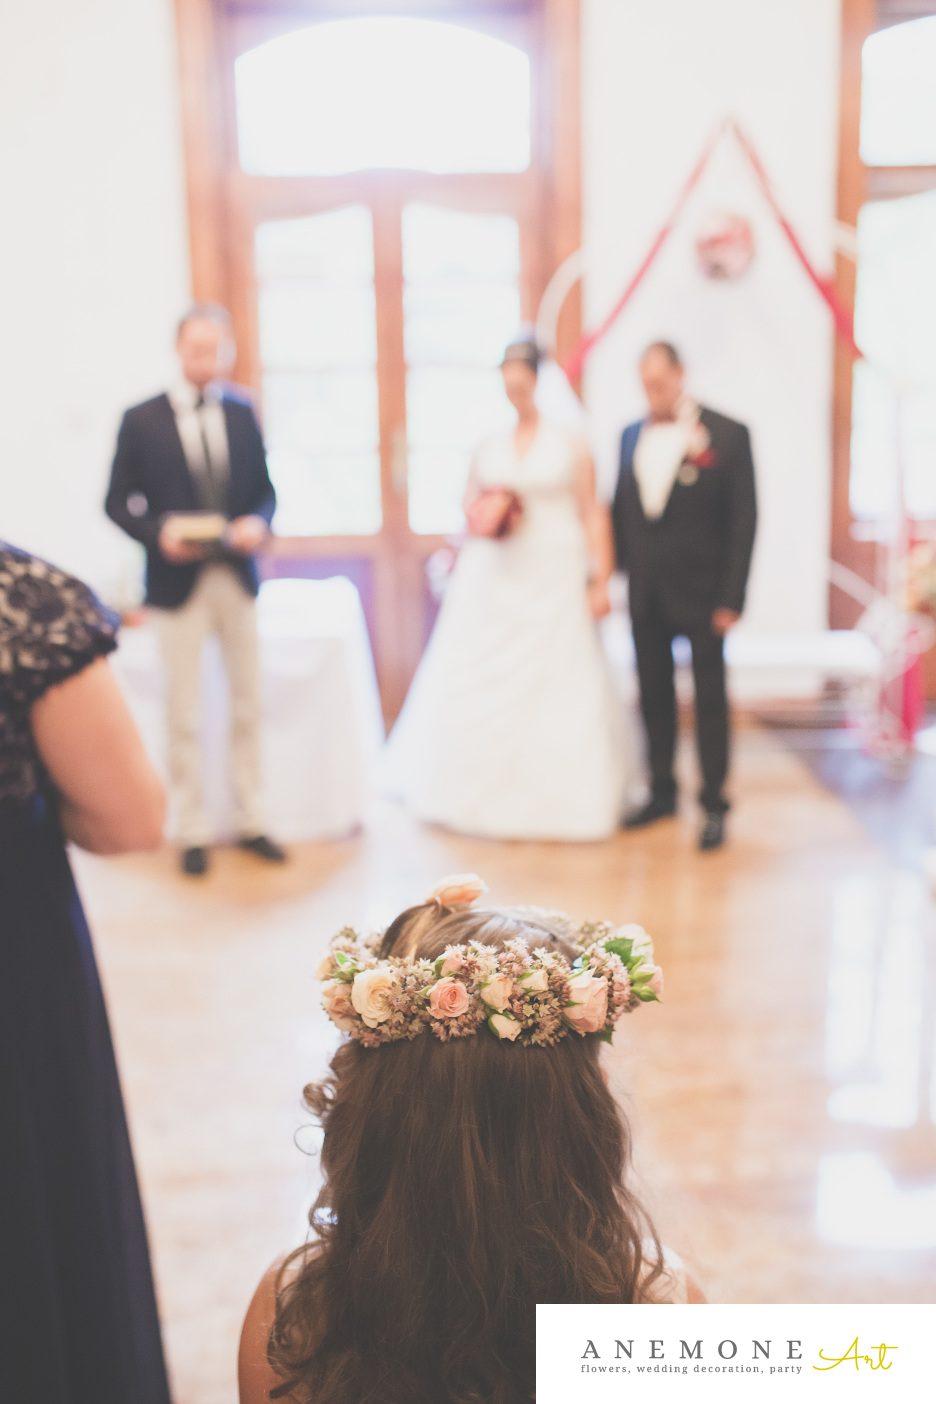 Poza, foto cu Flori de nunta aranjament par, coronita, miresuta, roz in Arad, Timisoara, Oradea (wedding flowers, bouquets) nunta Arad, Timisoara, Oradea